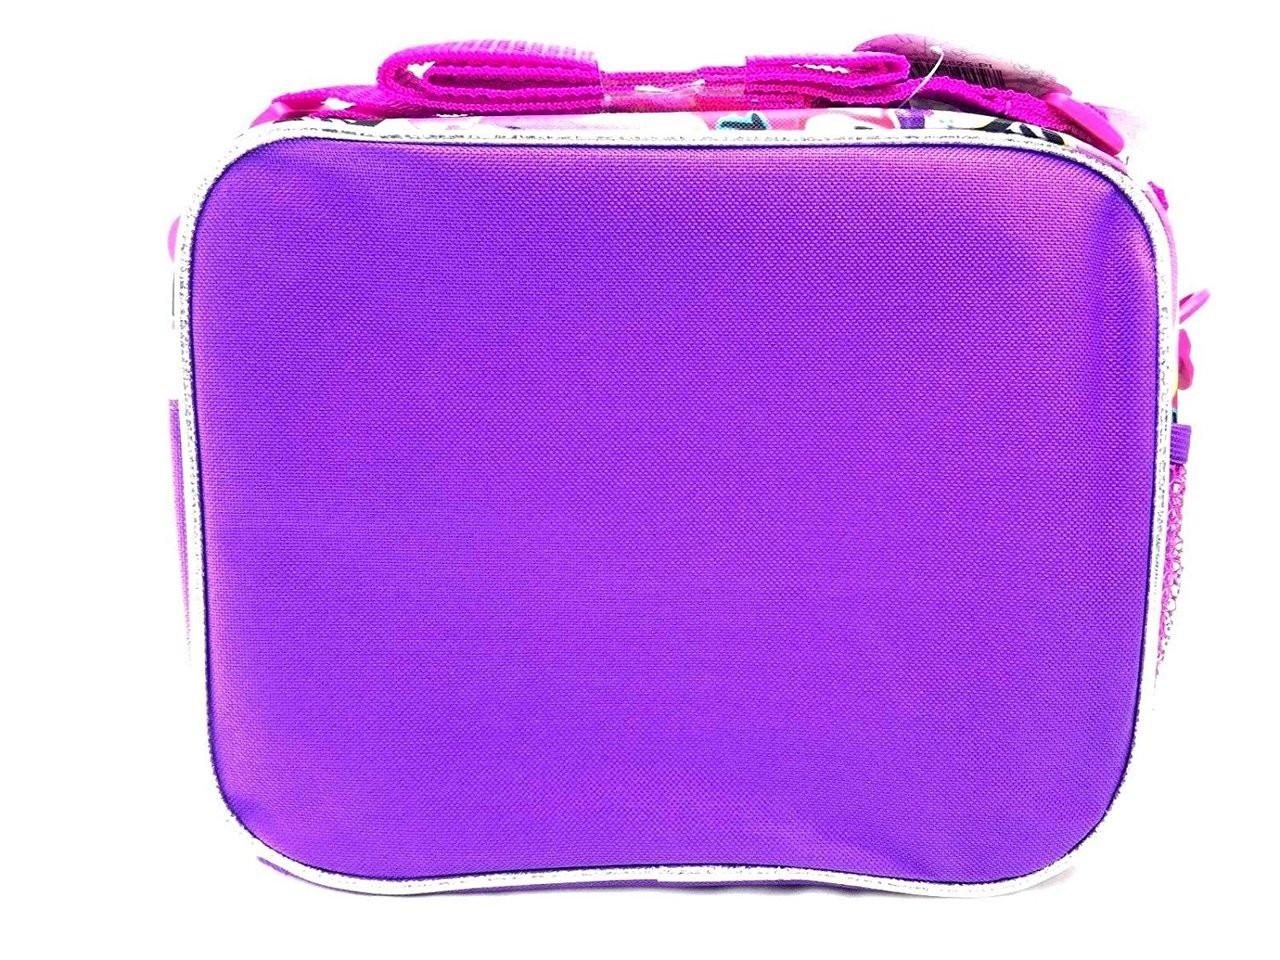 http://store-svx5q.mybigcommerce.com/product_images/web/843340149097-3.jpg